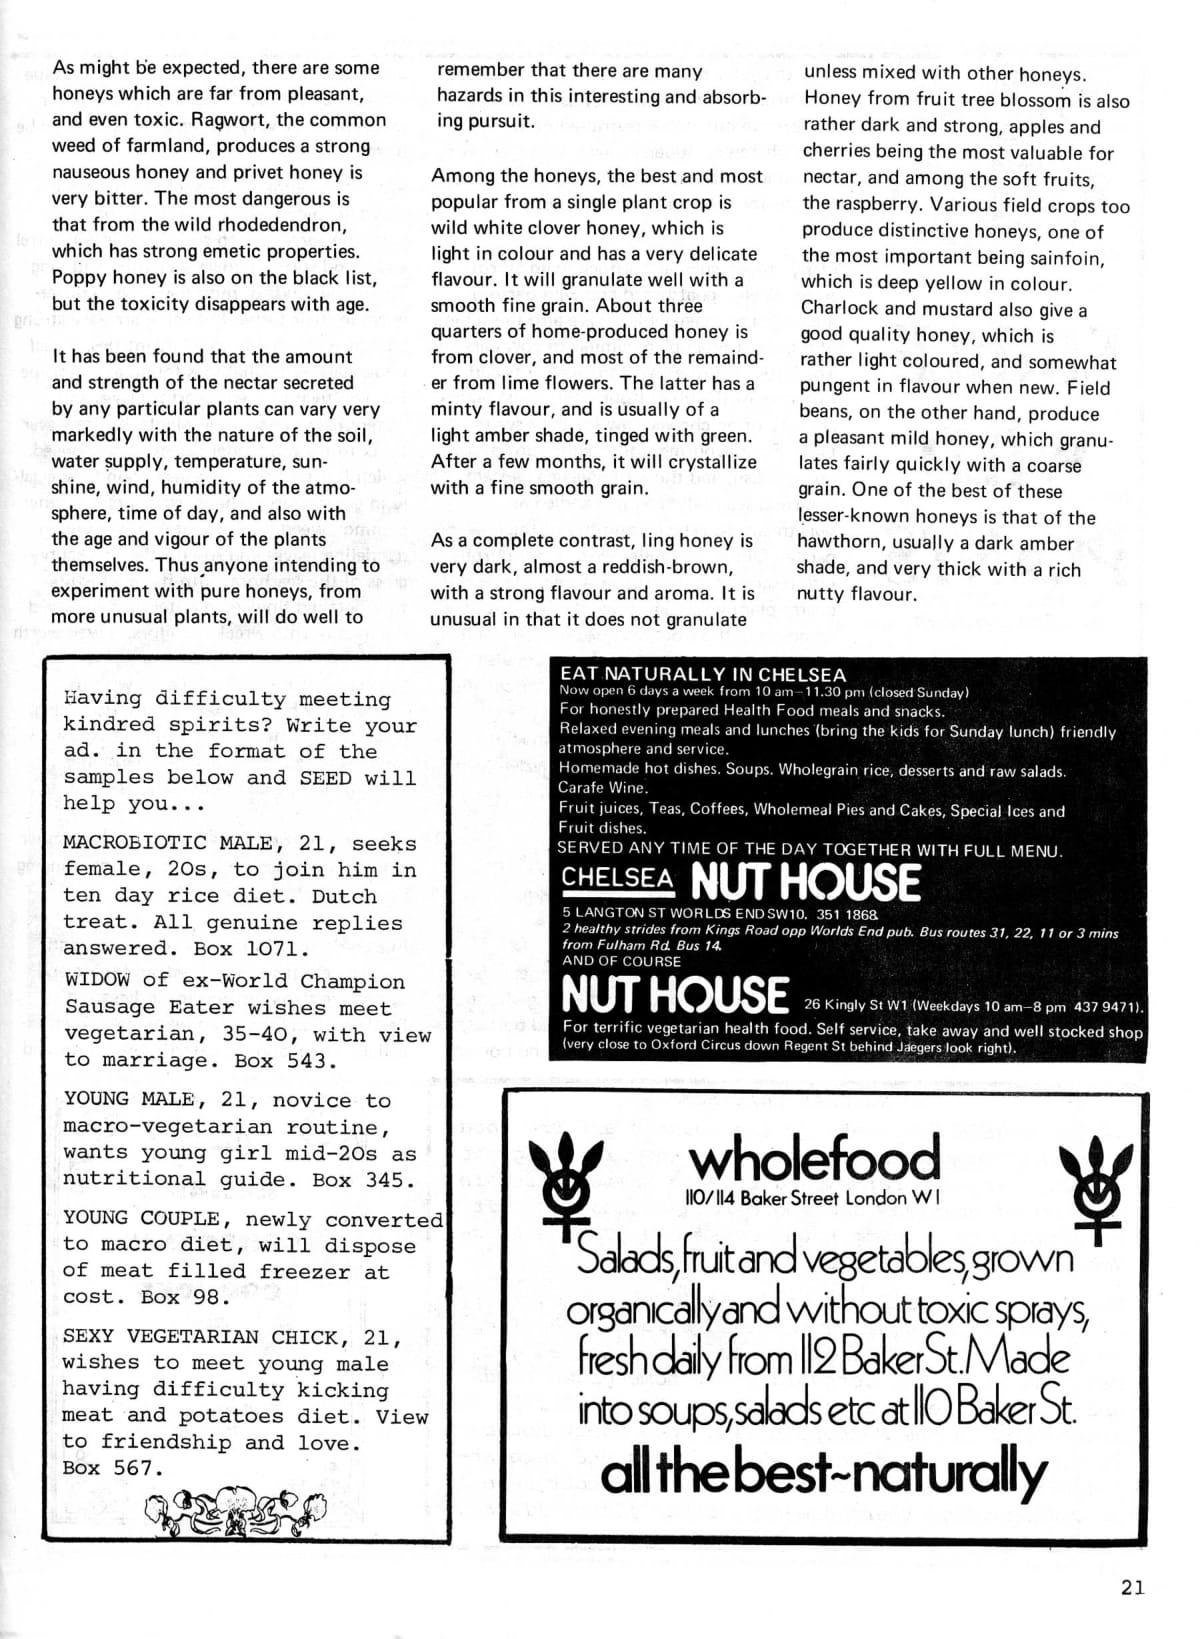 seed-v2-n4-april1973-21.jpg